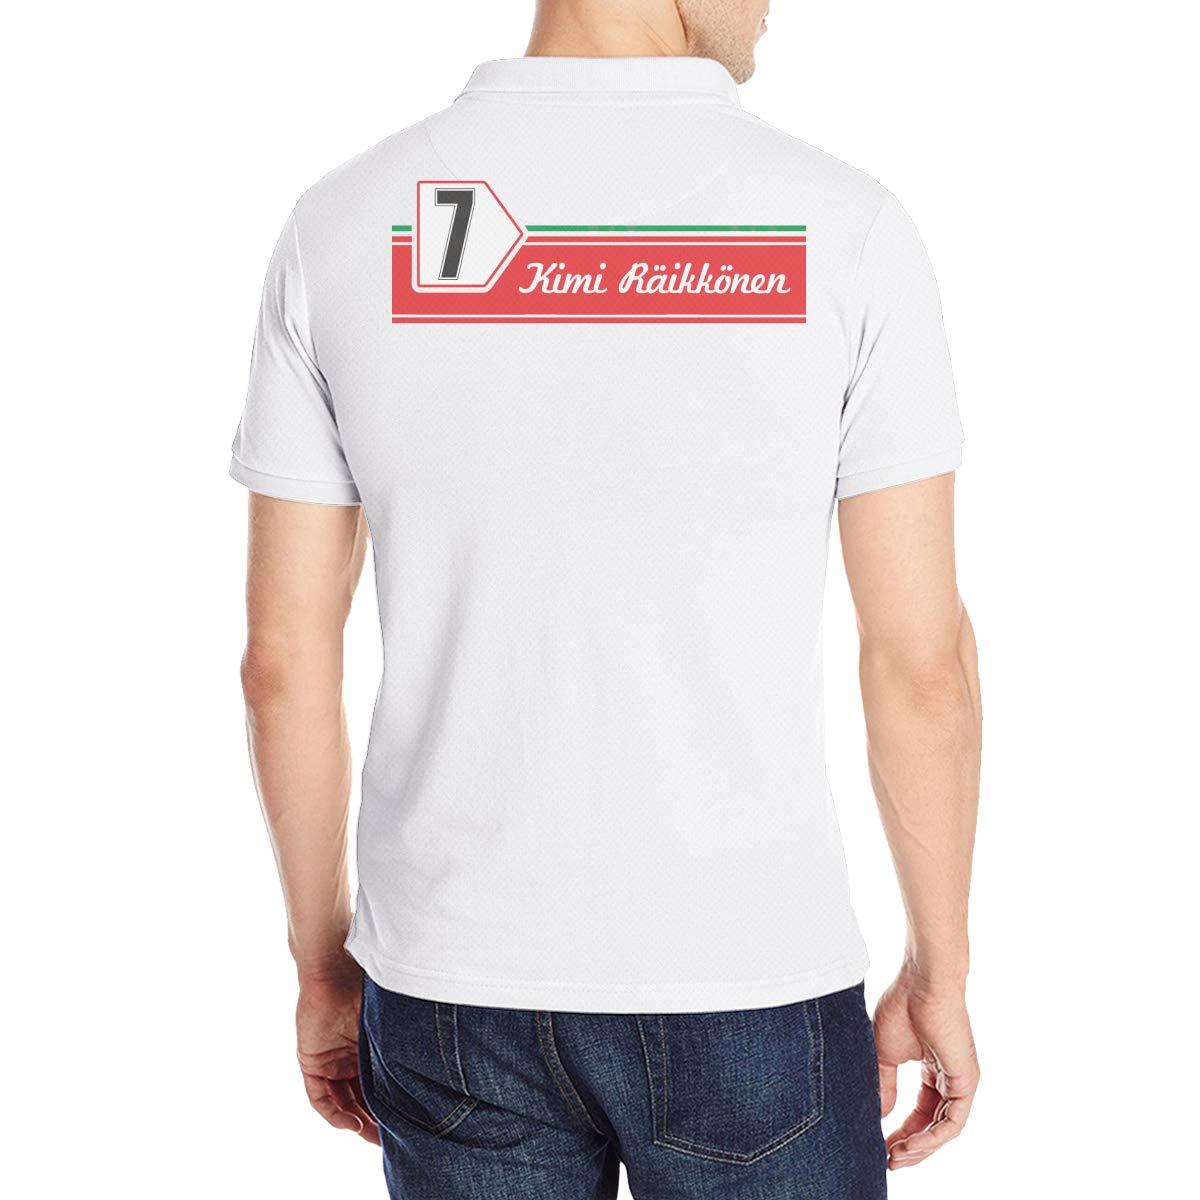 Arilce Kimi Raikkonen 7 Men Polo Shirt Short Sleeve Lapel Blouse Black